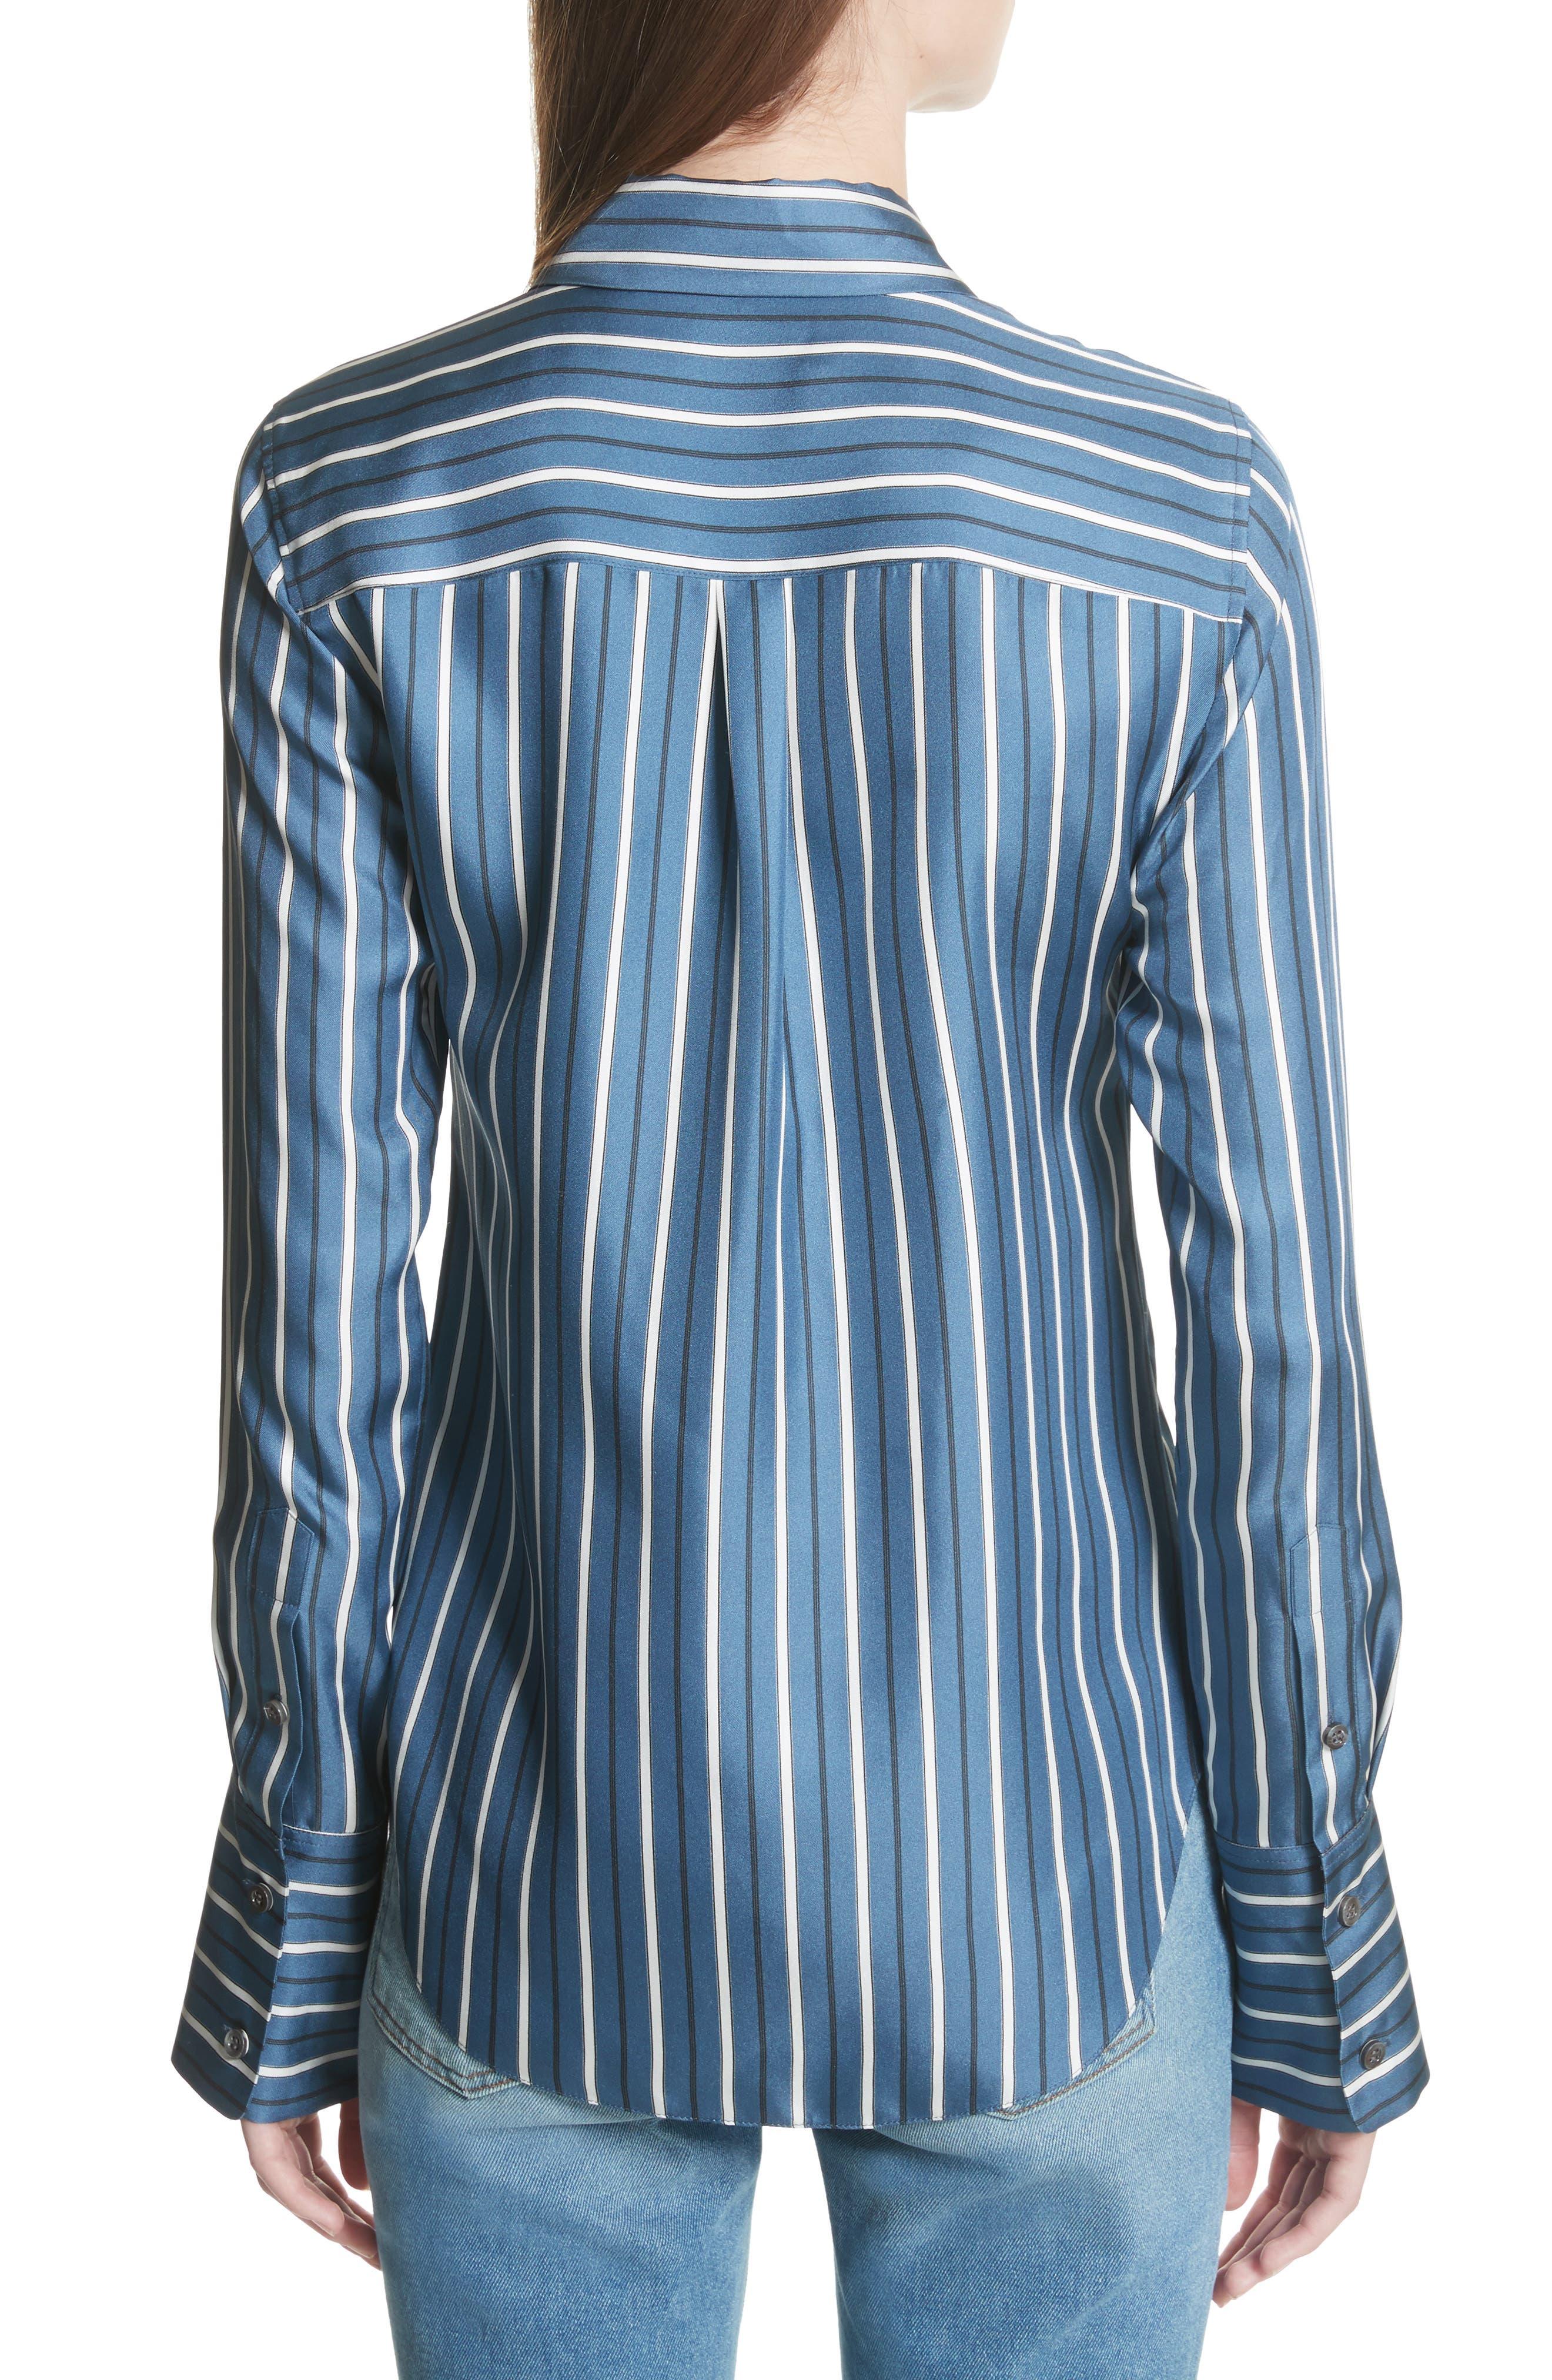 Darby Silk Button Shirt,                             Alternate thumbnail 2, color,                             491